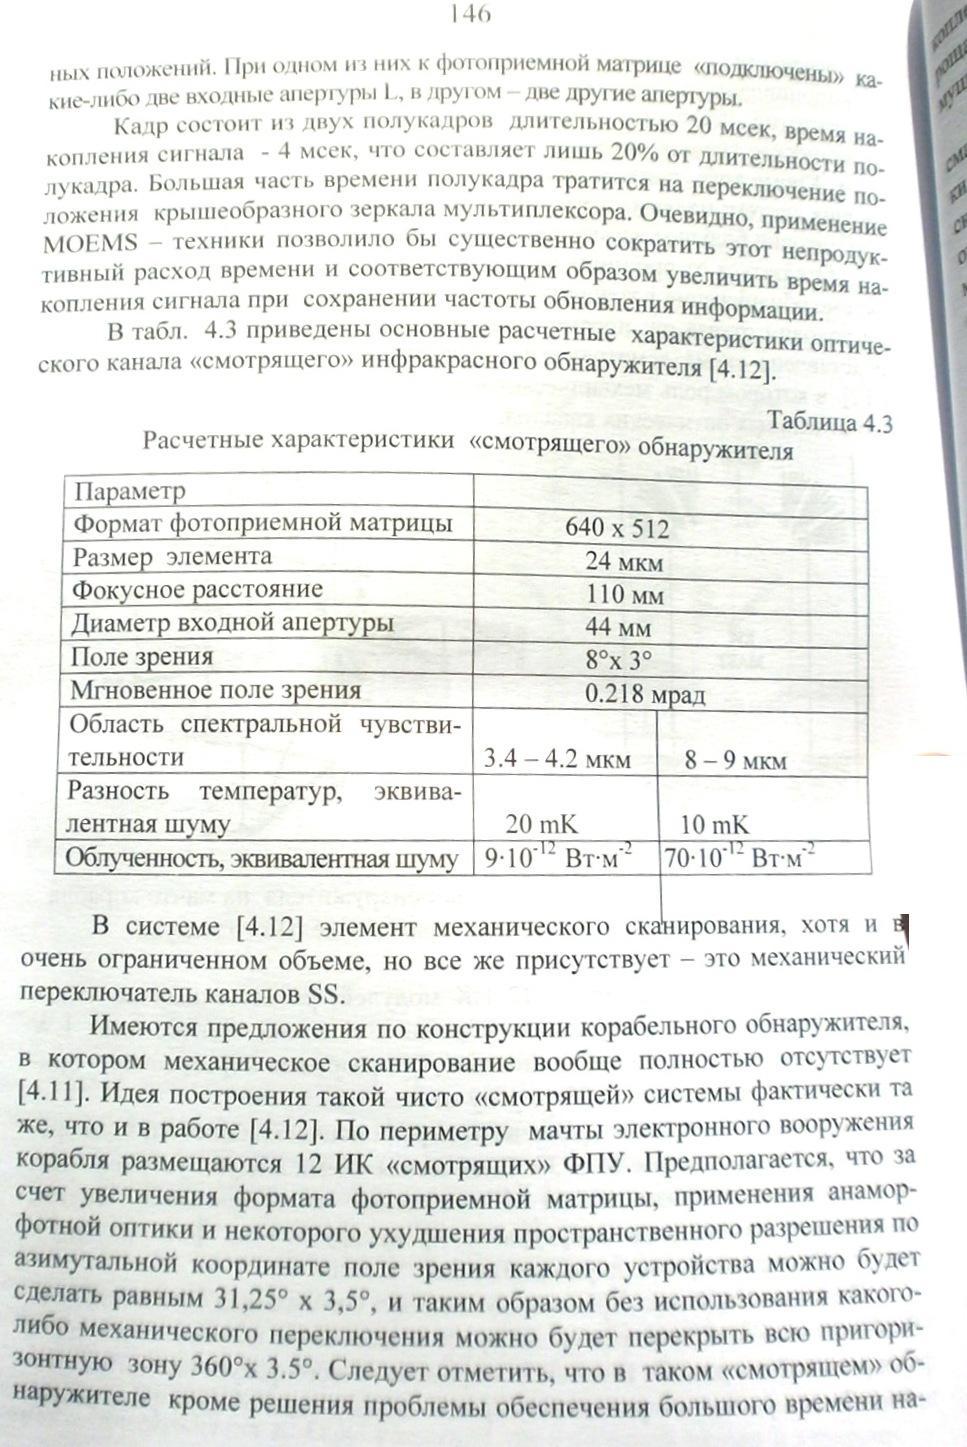 http://sh.uploads.ru/QrVvp.jpg